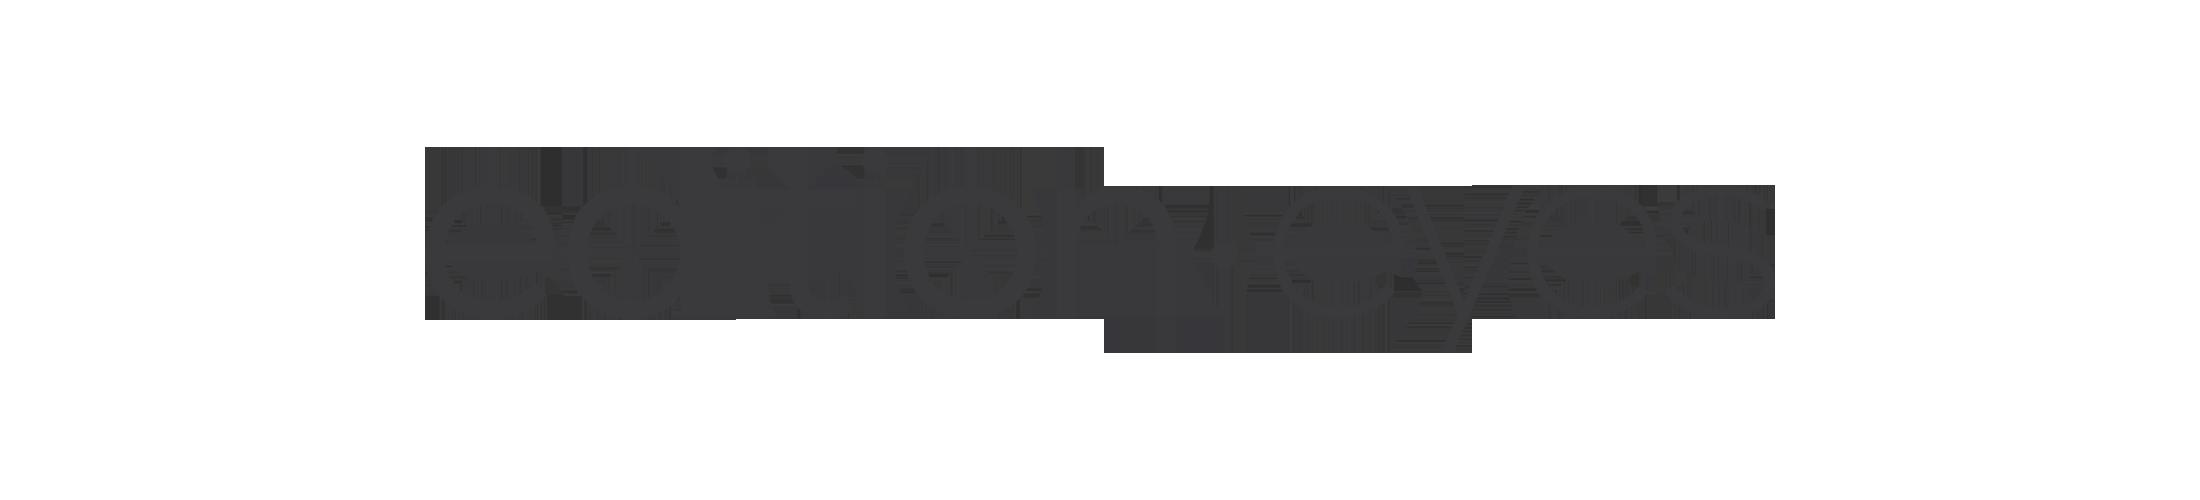 edition eyes logo